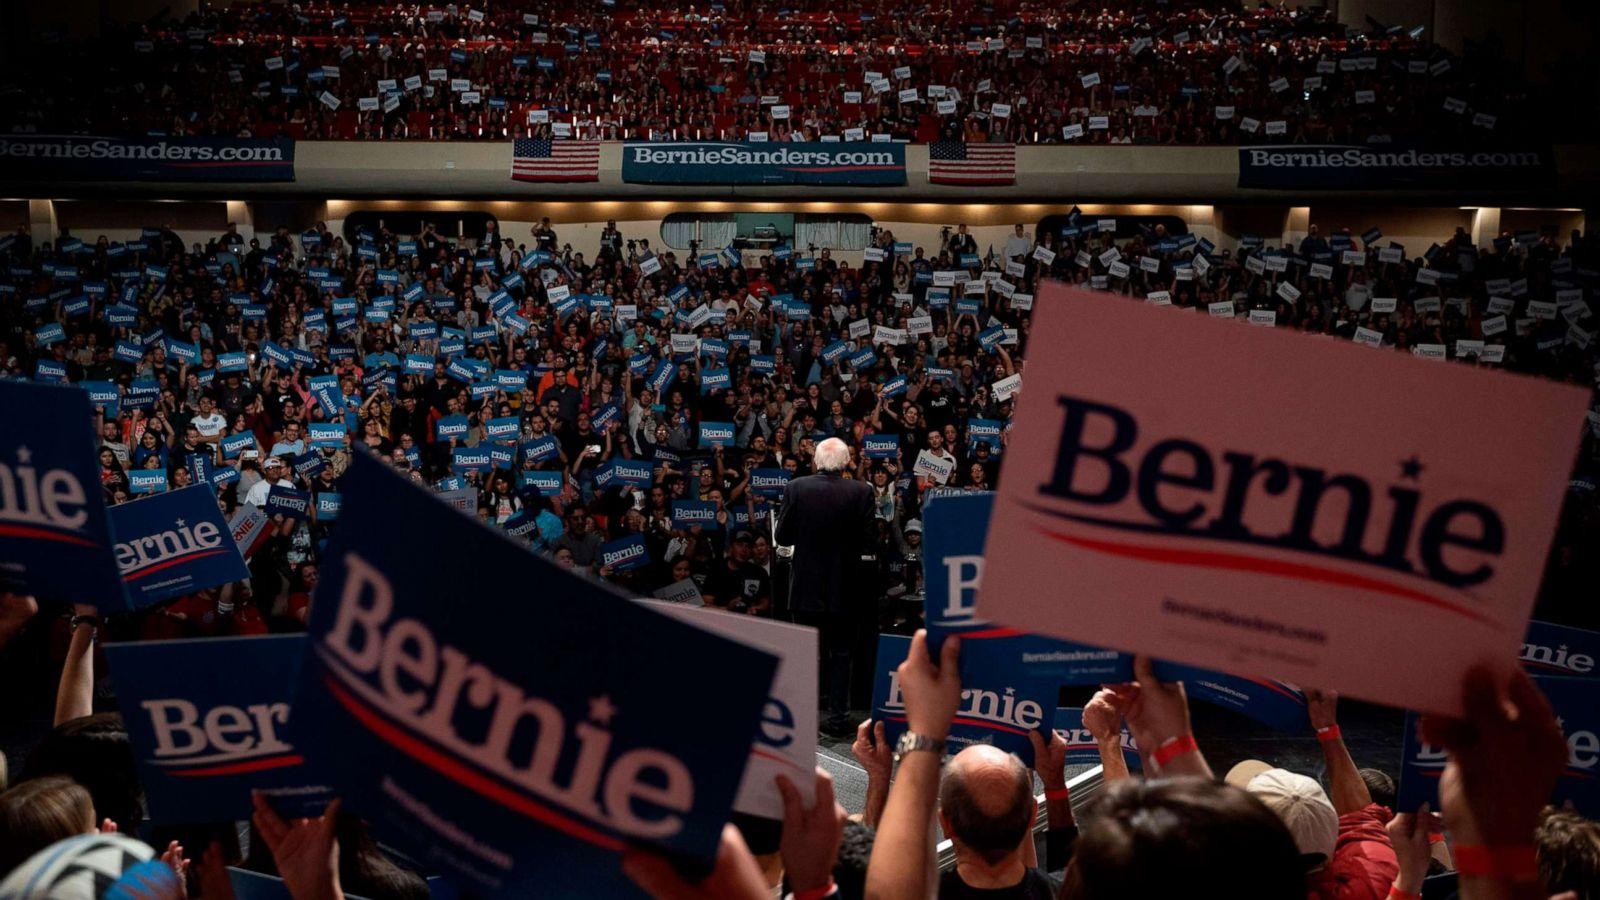 Bernie Sanders Official Rally Placard 2020 Presidential Campaign Sign Socialist